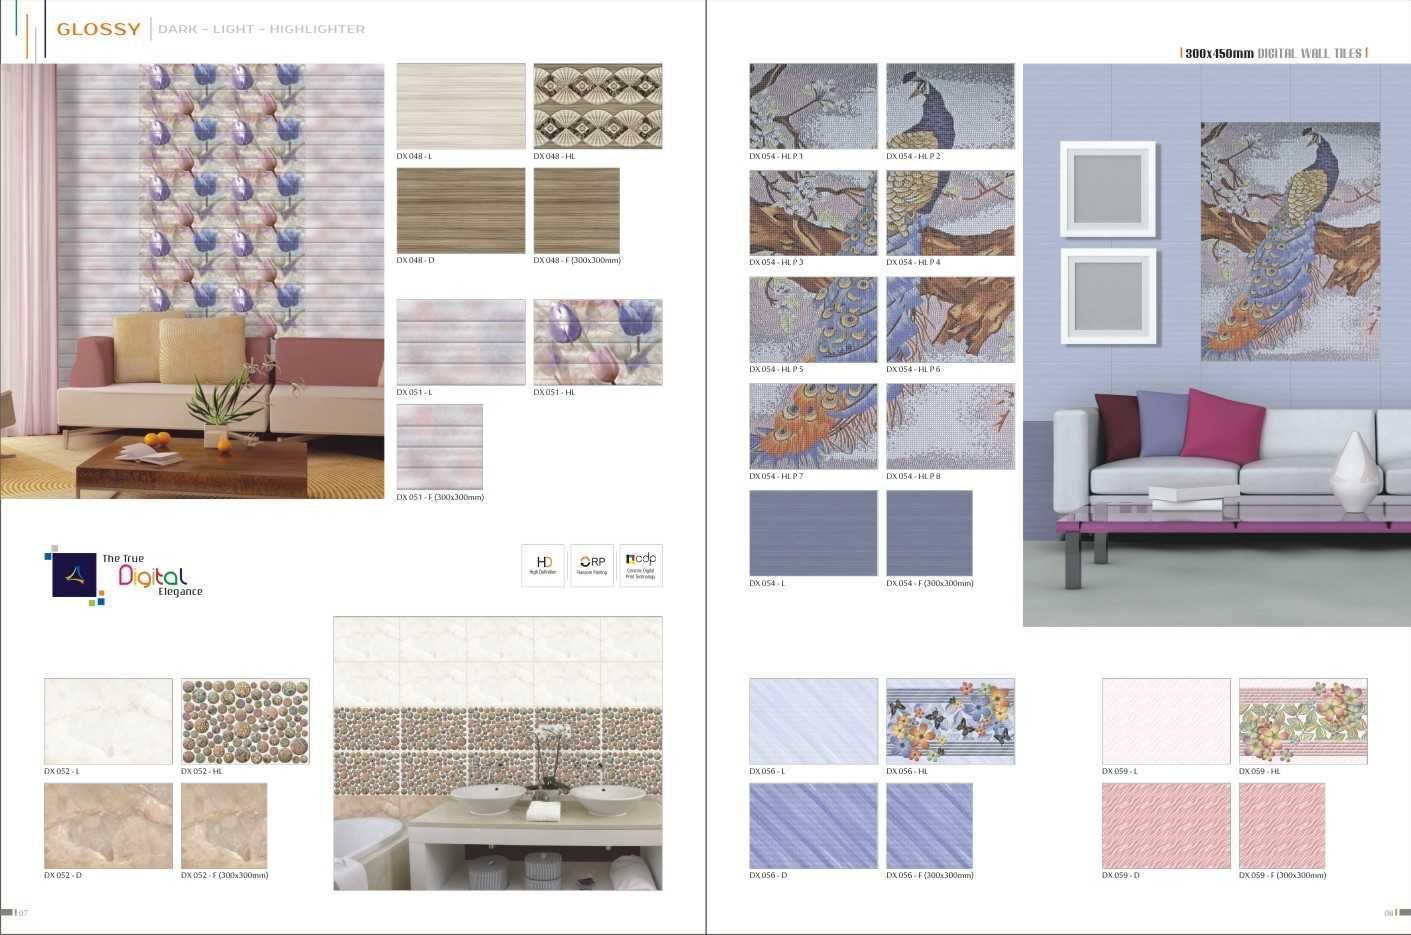 Pin by ceramic directory on dunexo ceramic tiles pinterest tile wall tiles backsplash tile tile manufacturers ceramics tile design room tiles pottery ceramica porcelain dailygadgetfo Images